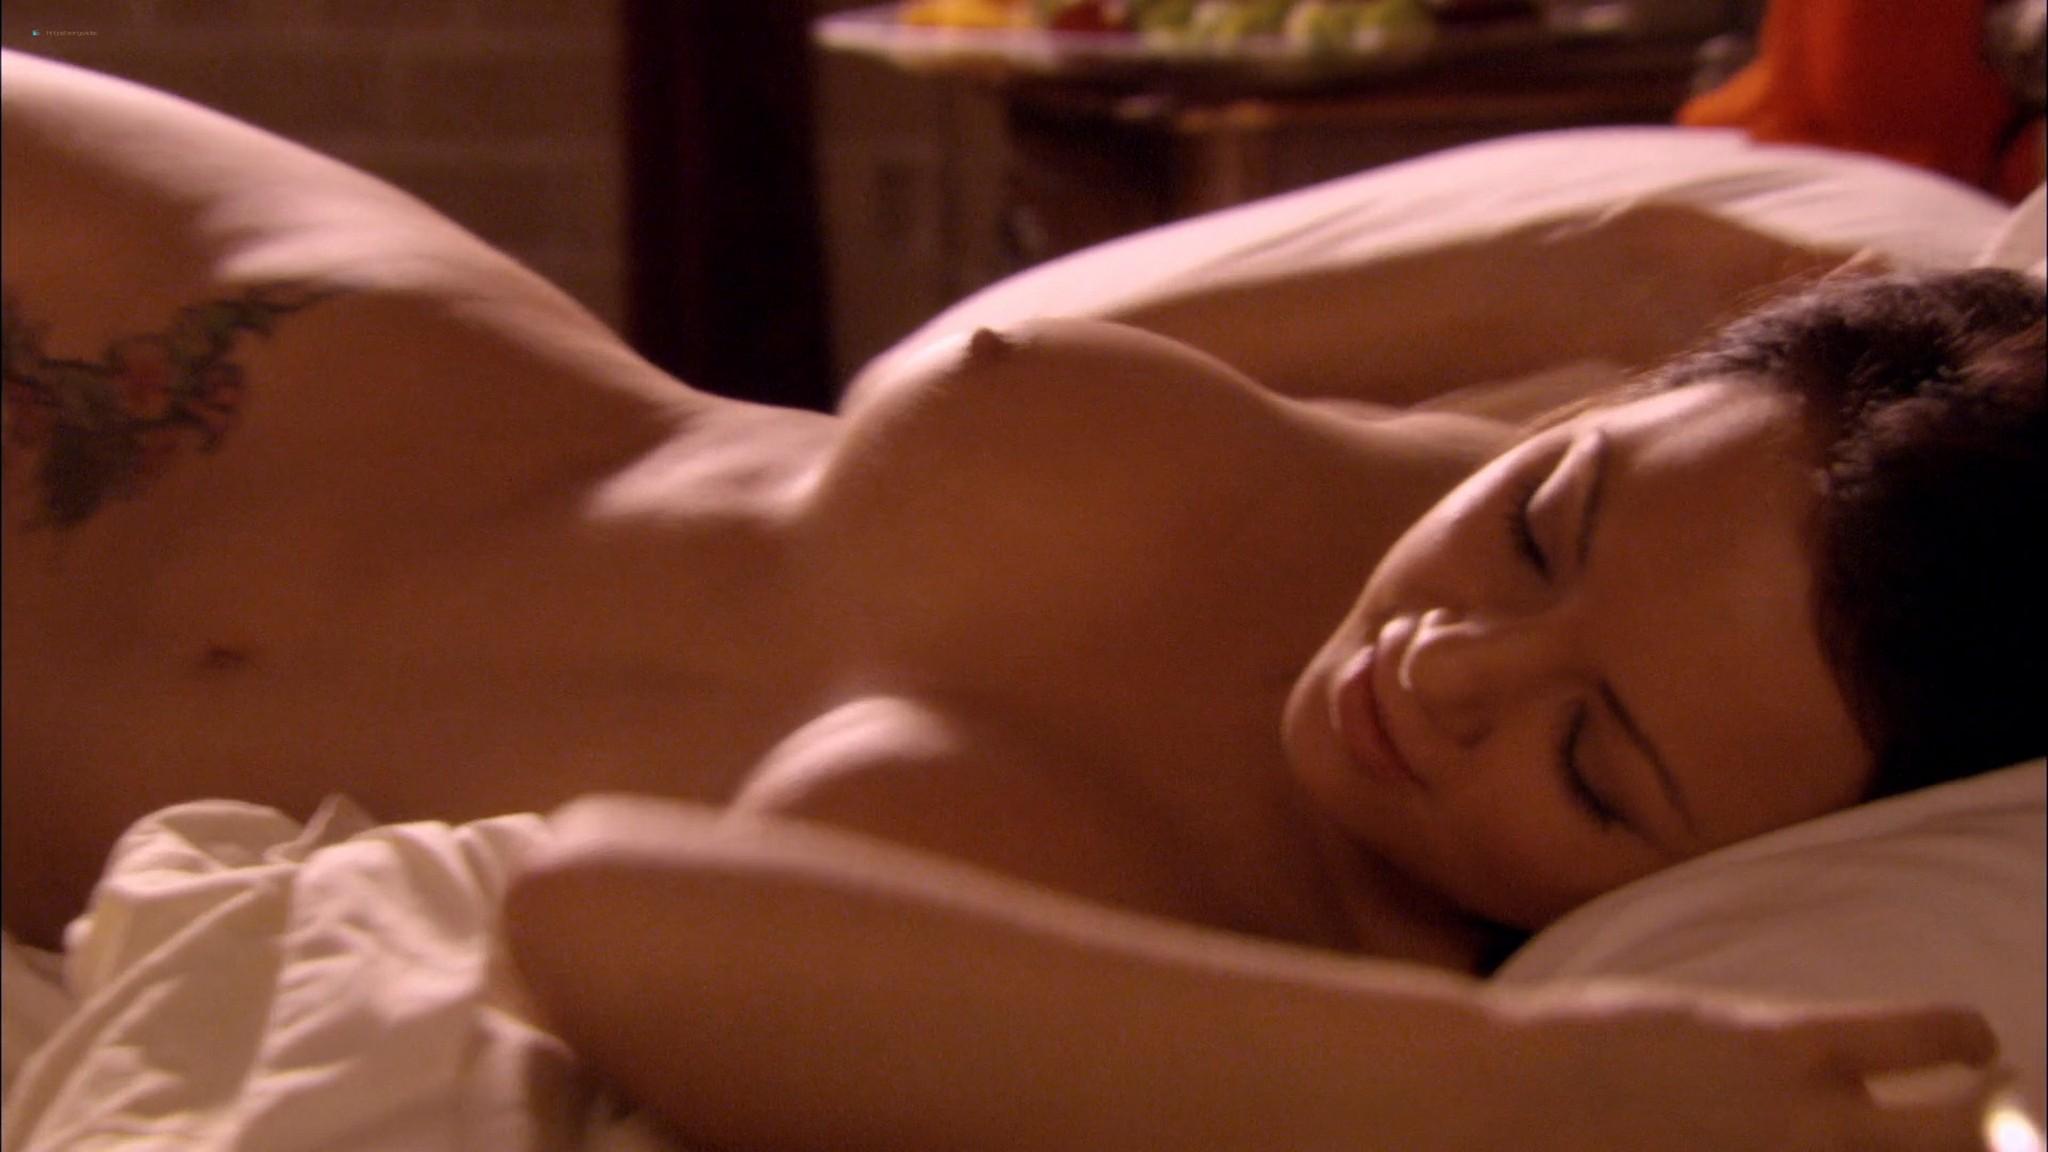 Lana Tailor nude sex Denise Cobar Jennifer Korbin all nude and hot sex Lingerie 2010 s2e7 HD 1080p Web 6